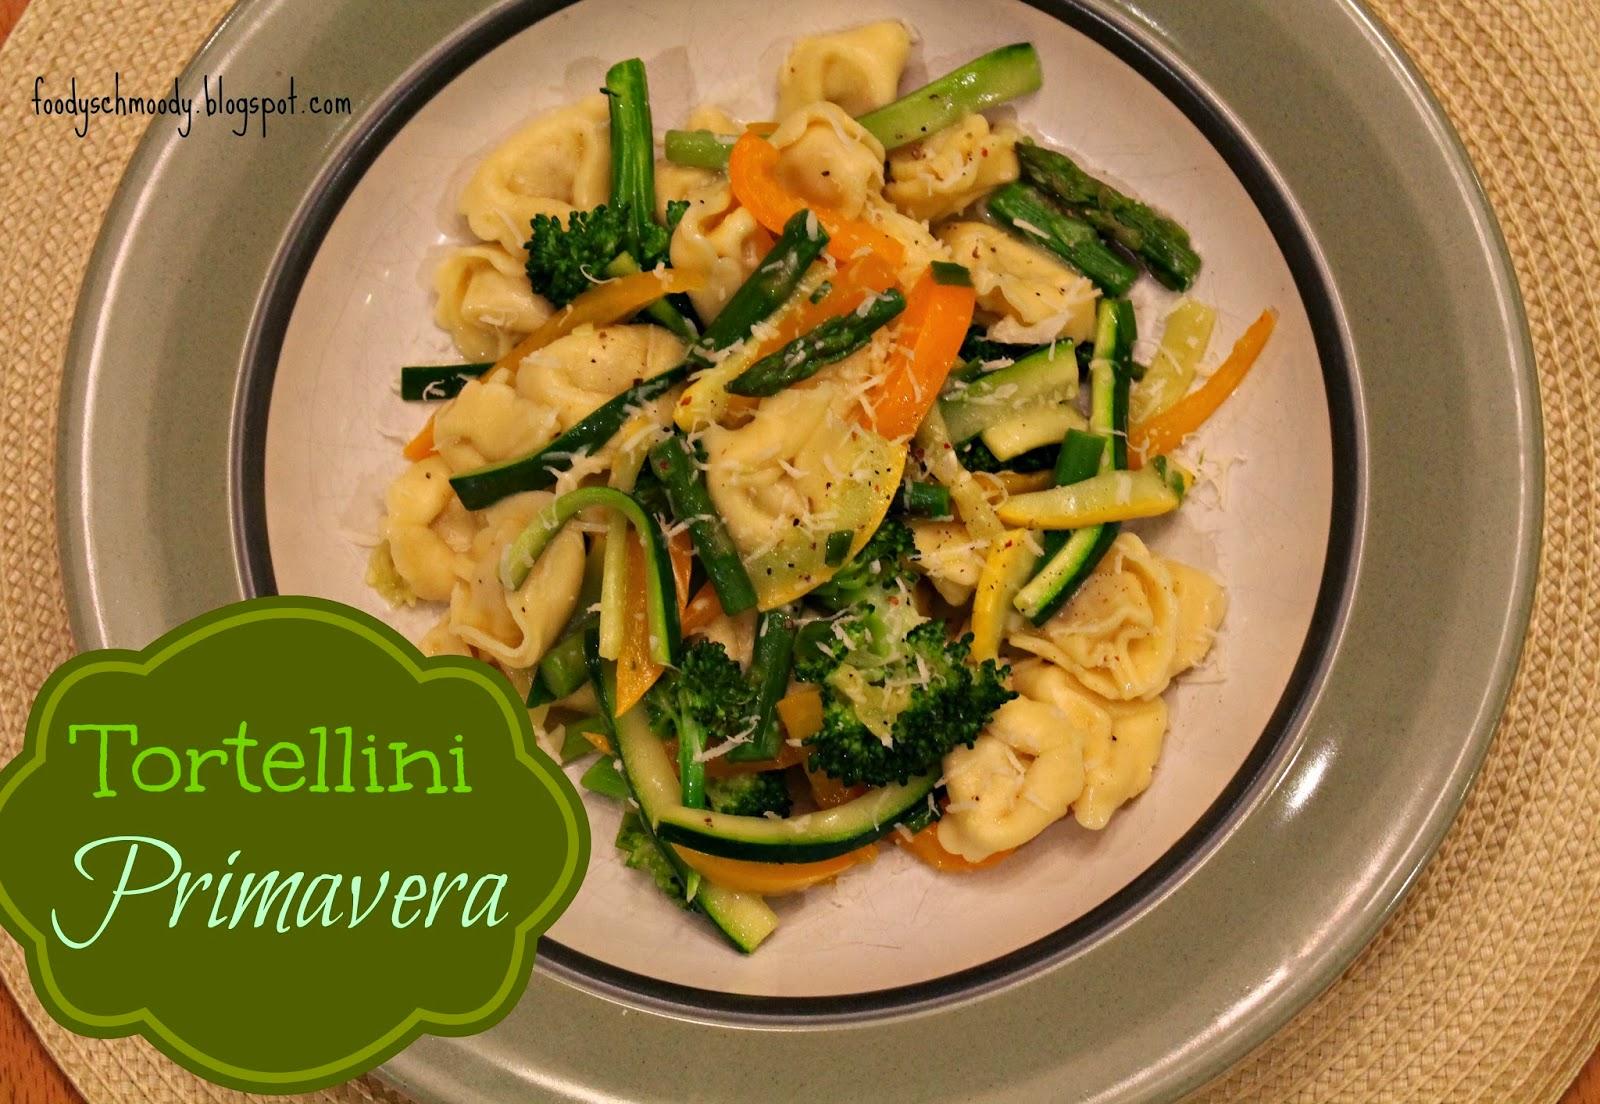 Tortellini Primavera by Foody Schmoody